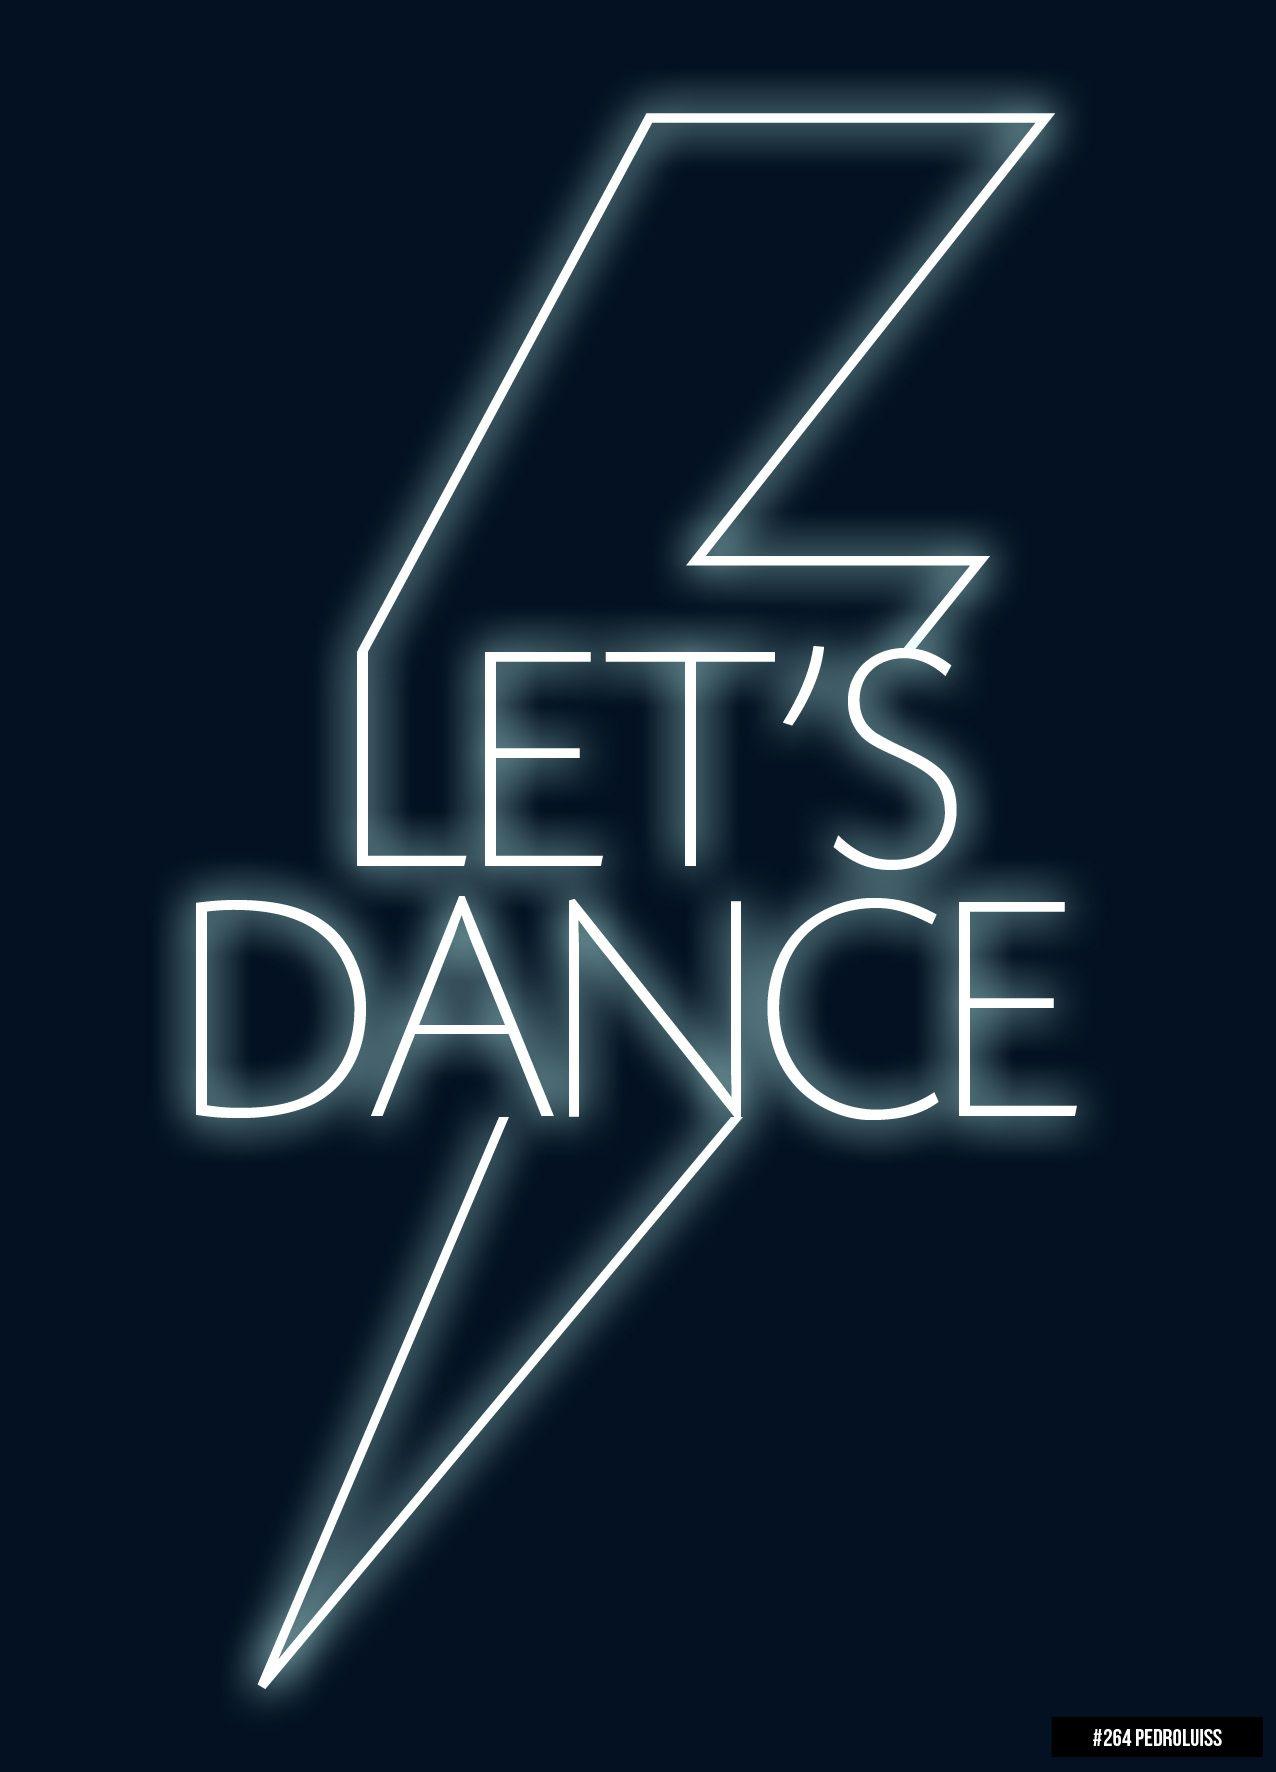 let's dance - 541×1001